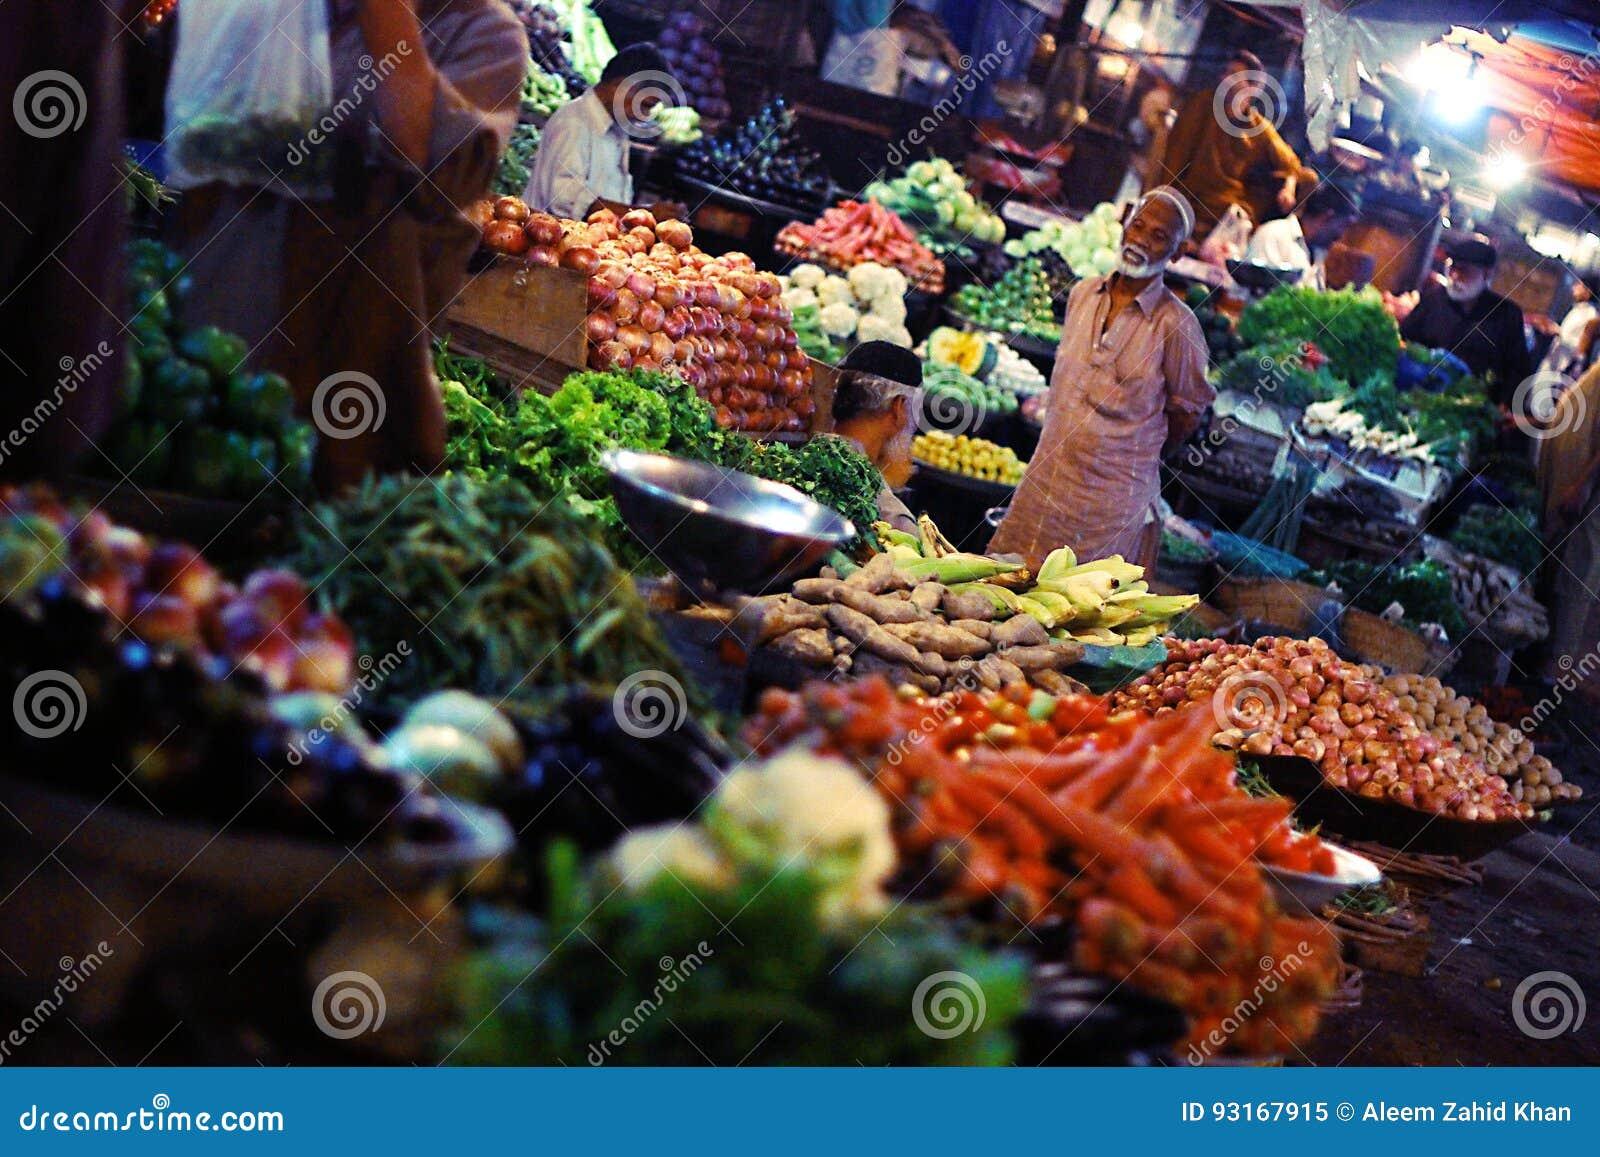 Mallu bazar market karachi pakistan - 4 5